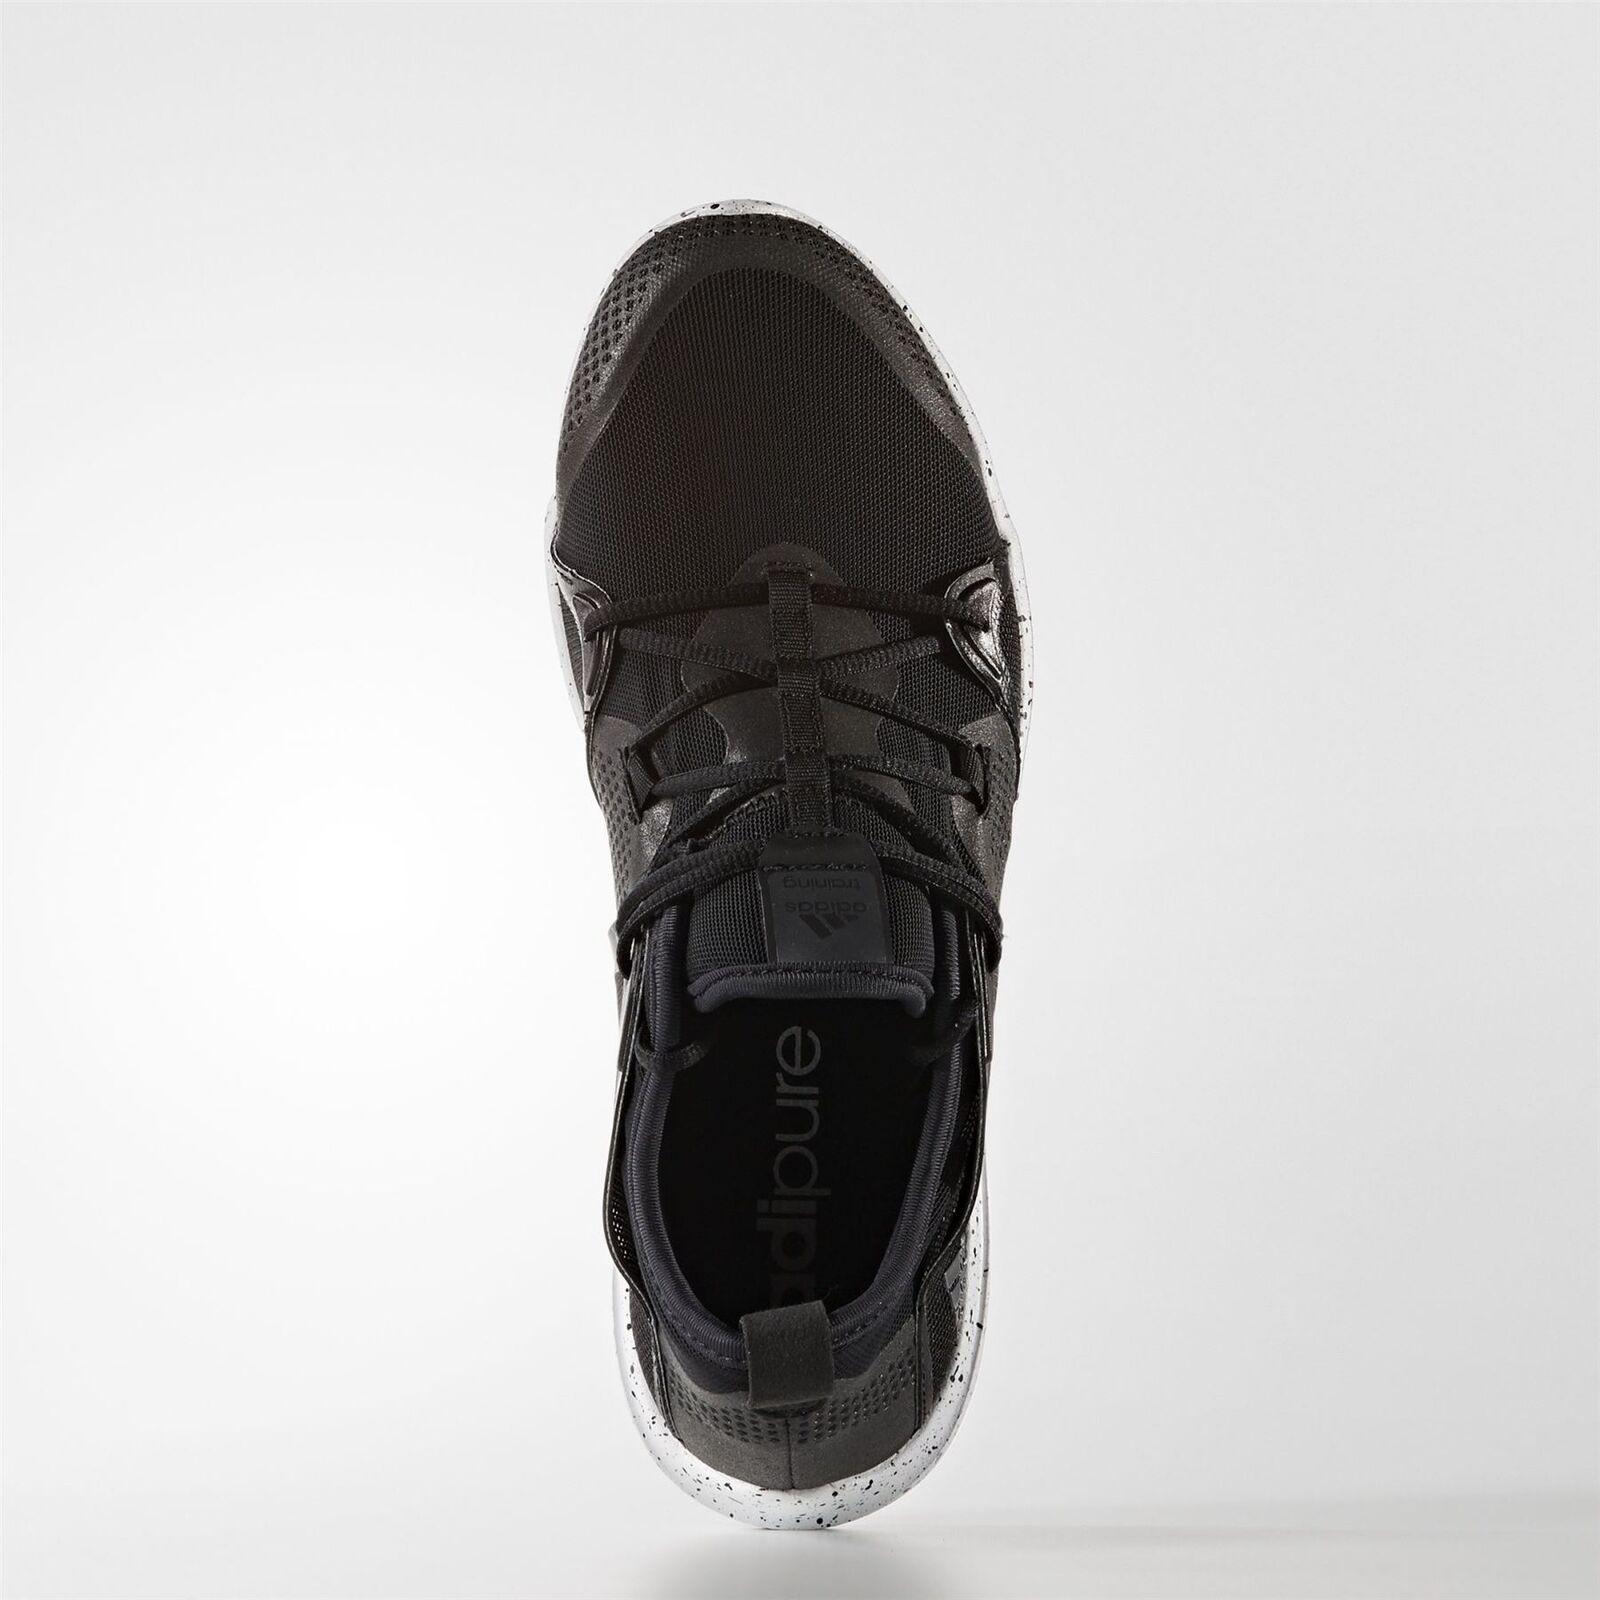 Adidas Adipure 360.4 Trainers Womens Black Black Black Training shoes Gym Fitness Sneakers 8c835b